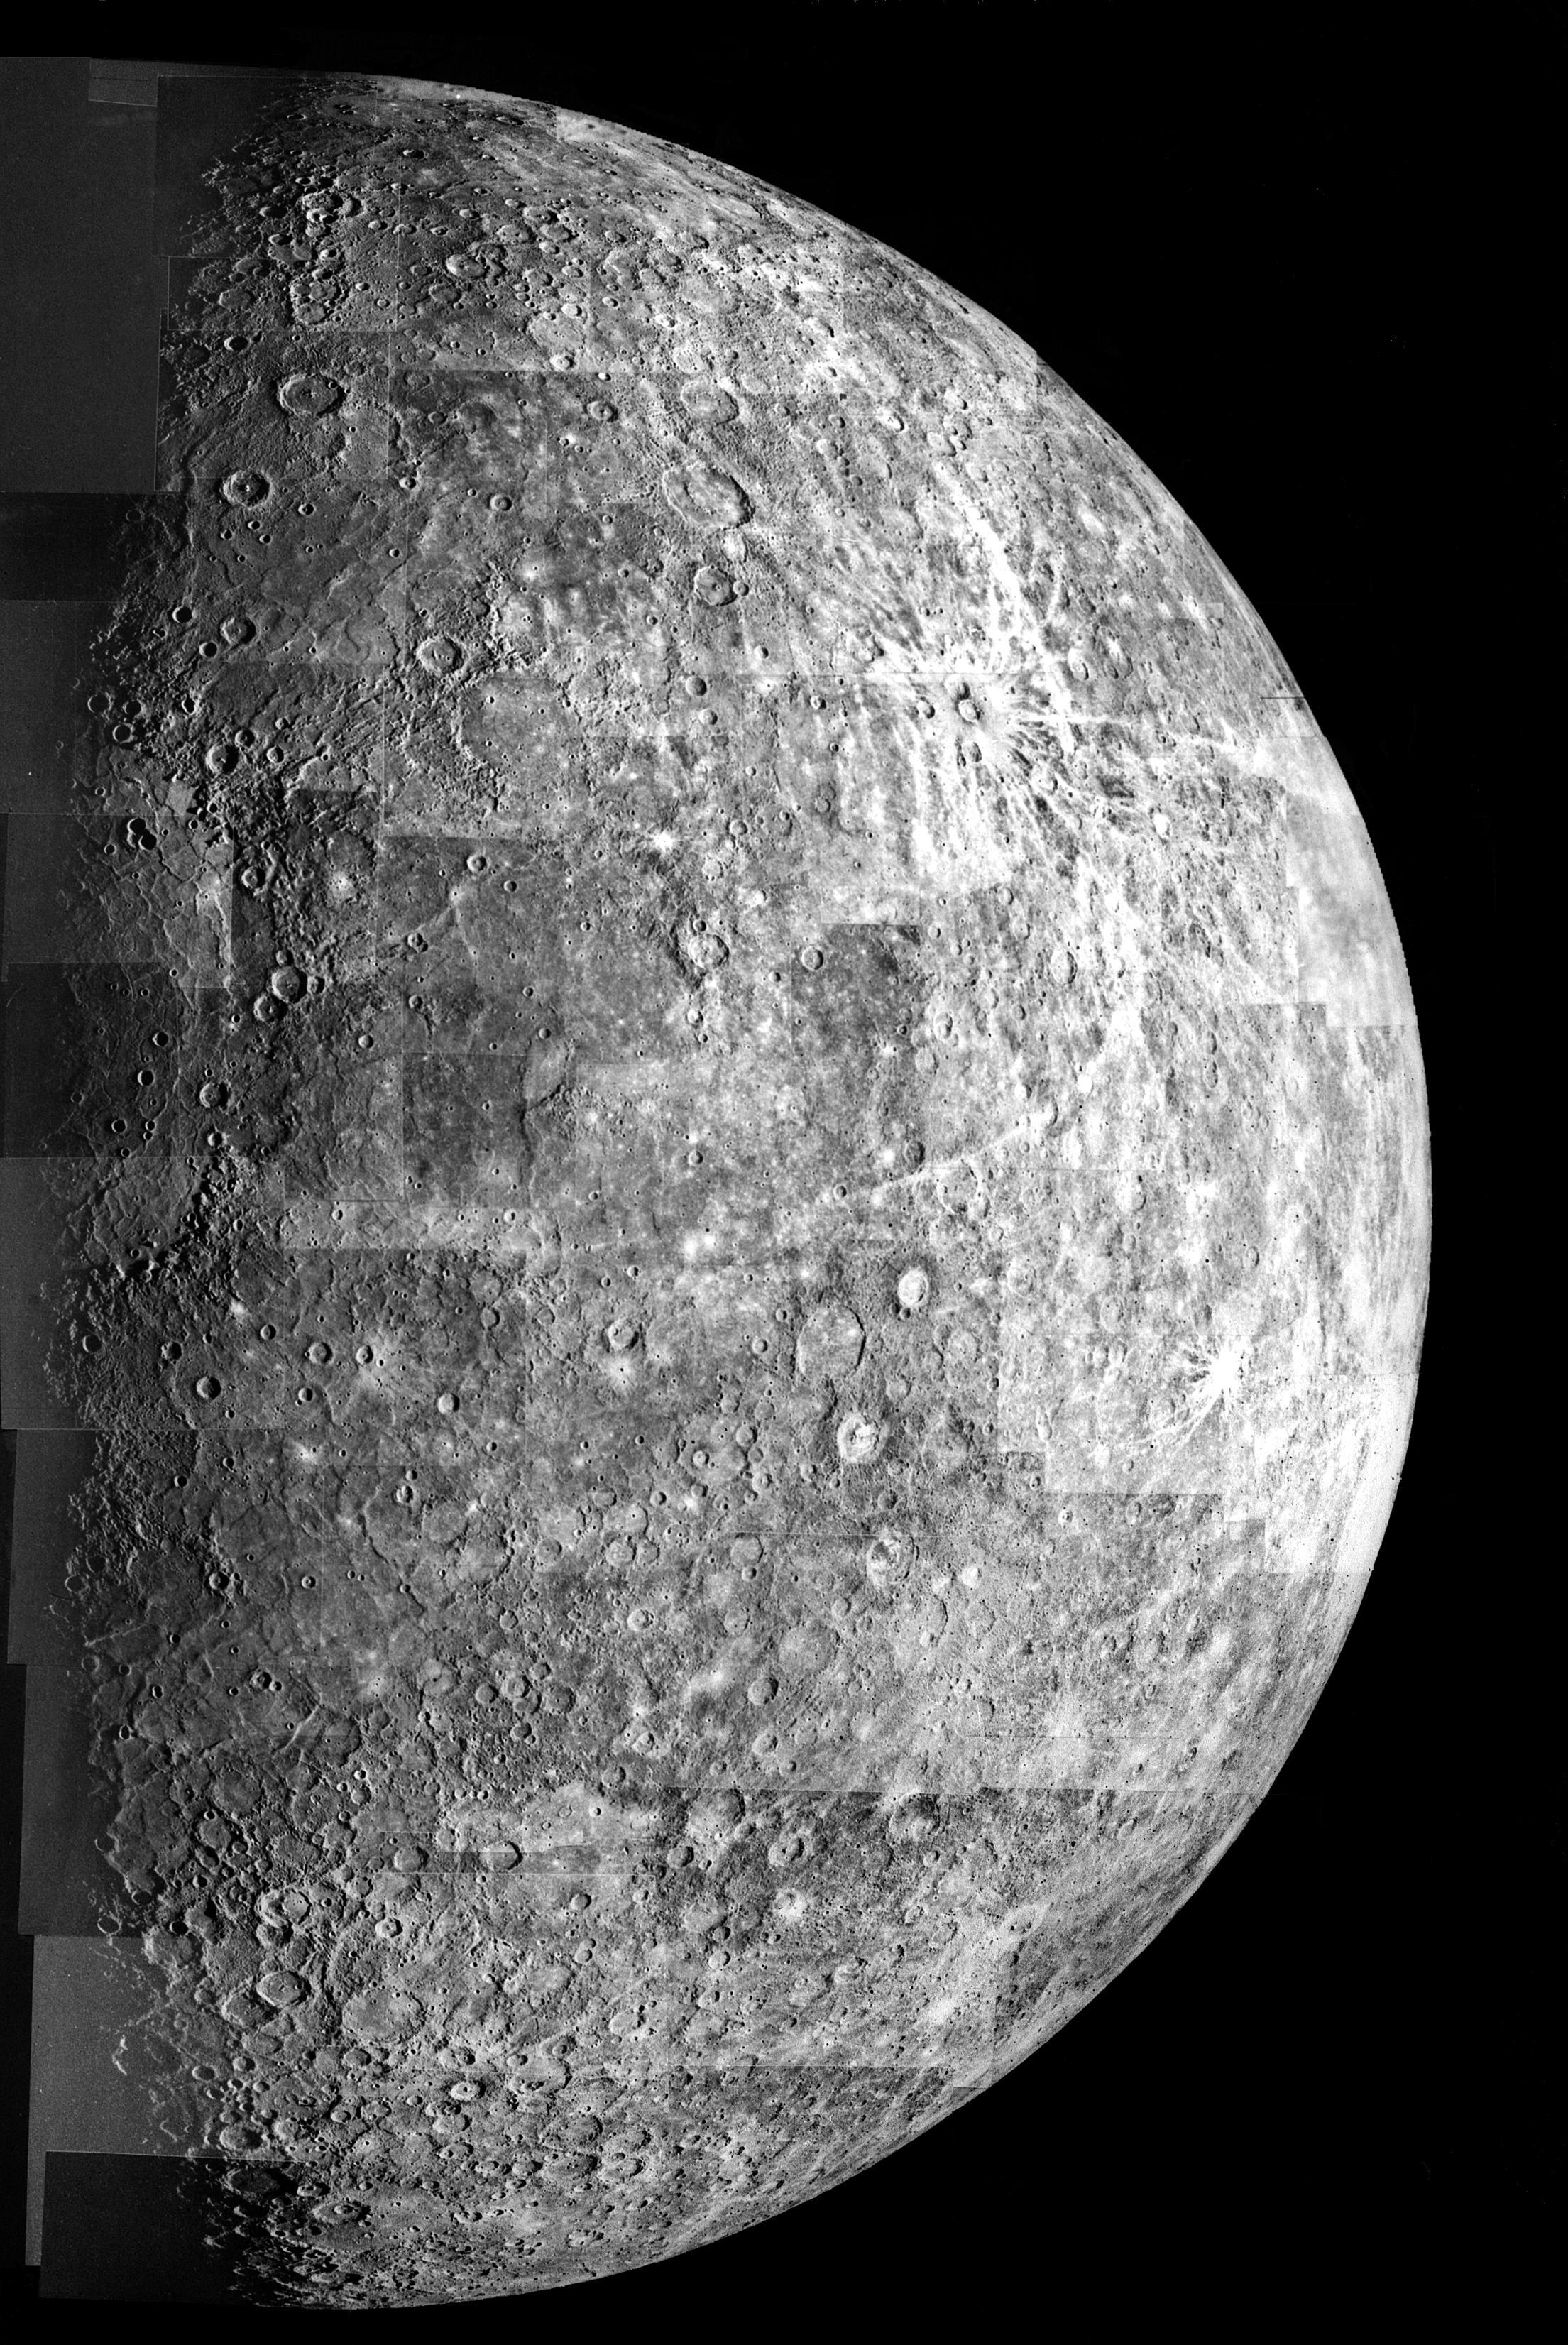 Photomosaic of Mercury - Outbound View. NASA/JPL